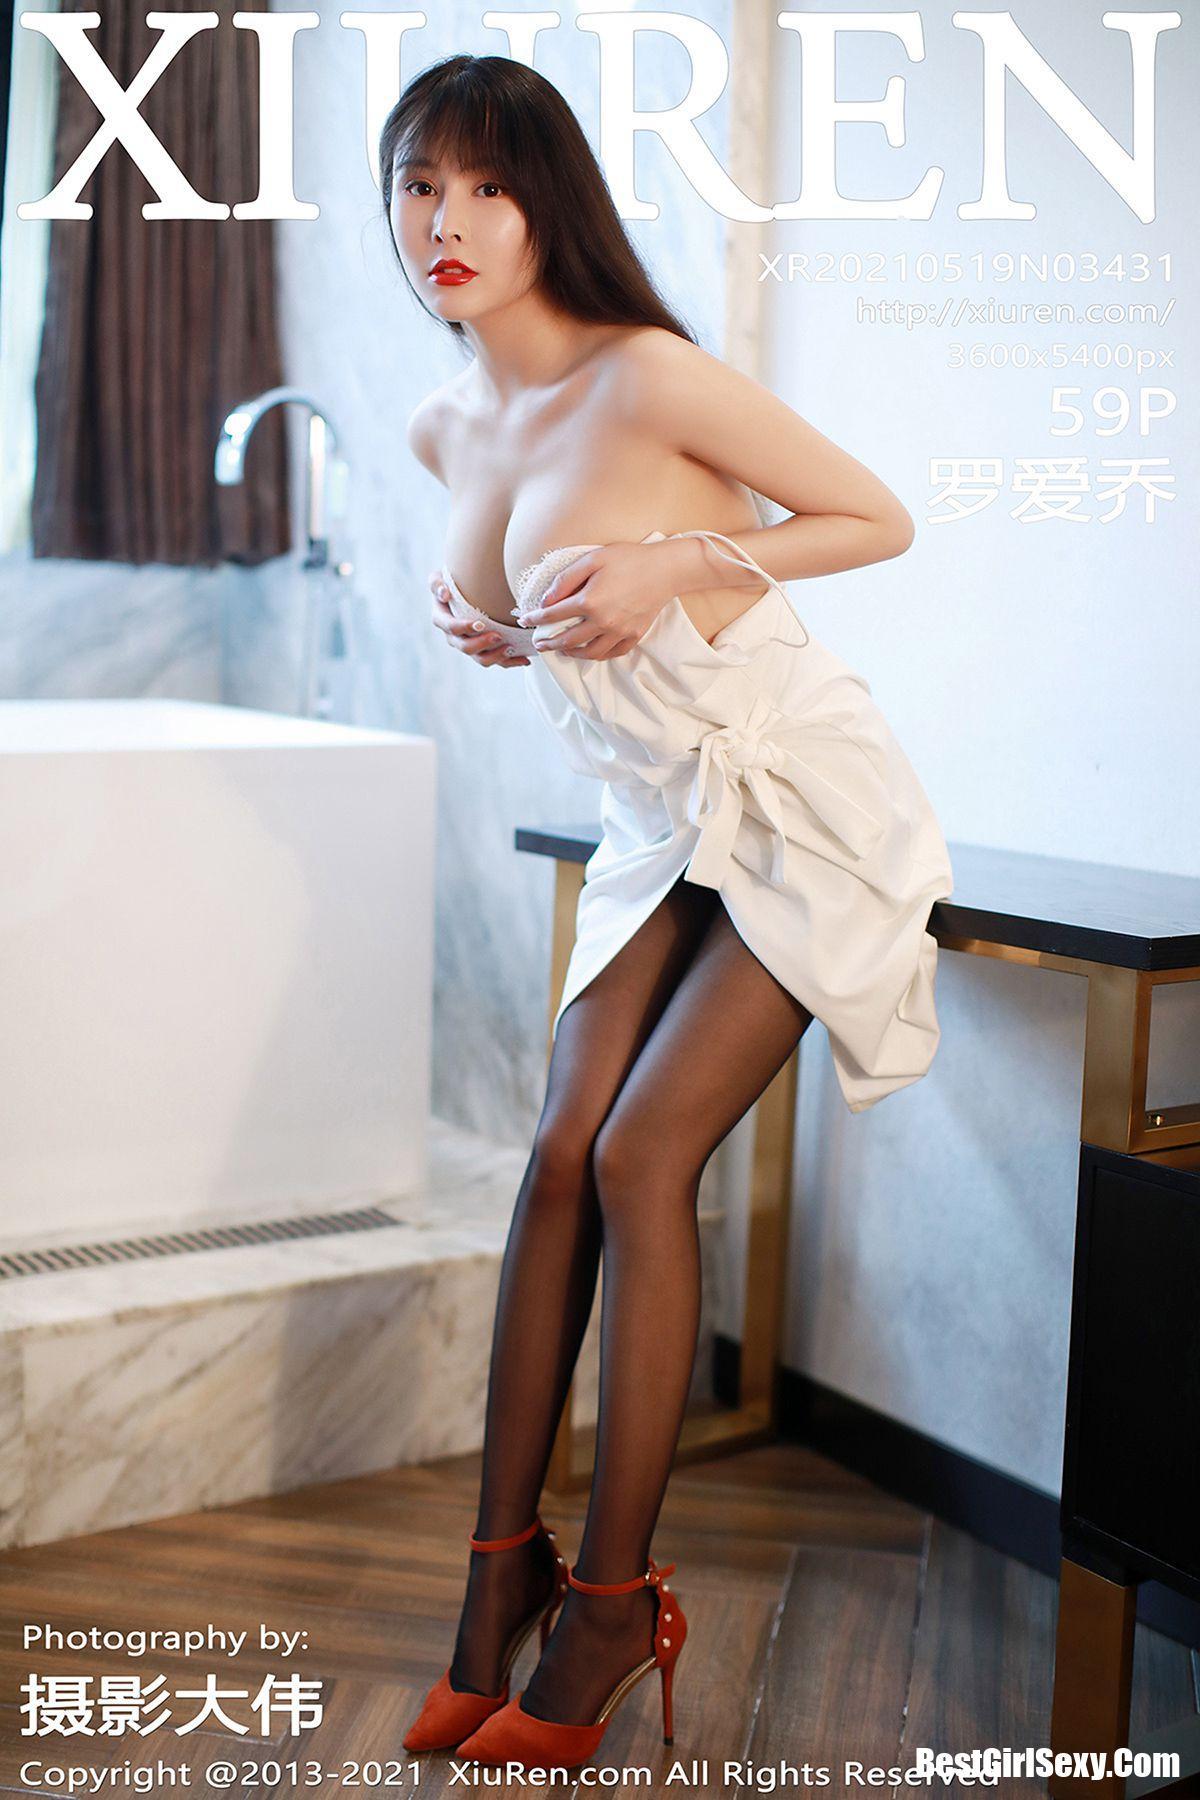 罗爱乔, XiuRen秀人网 No.3431 Luo Ai Qiao, XiuRen秀人网 No.3431, Luo Ai Qiao